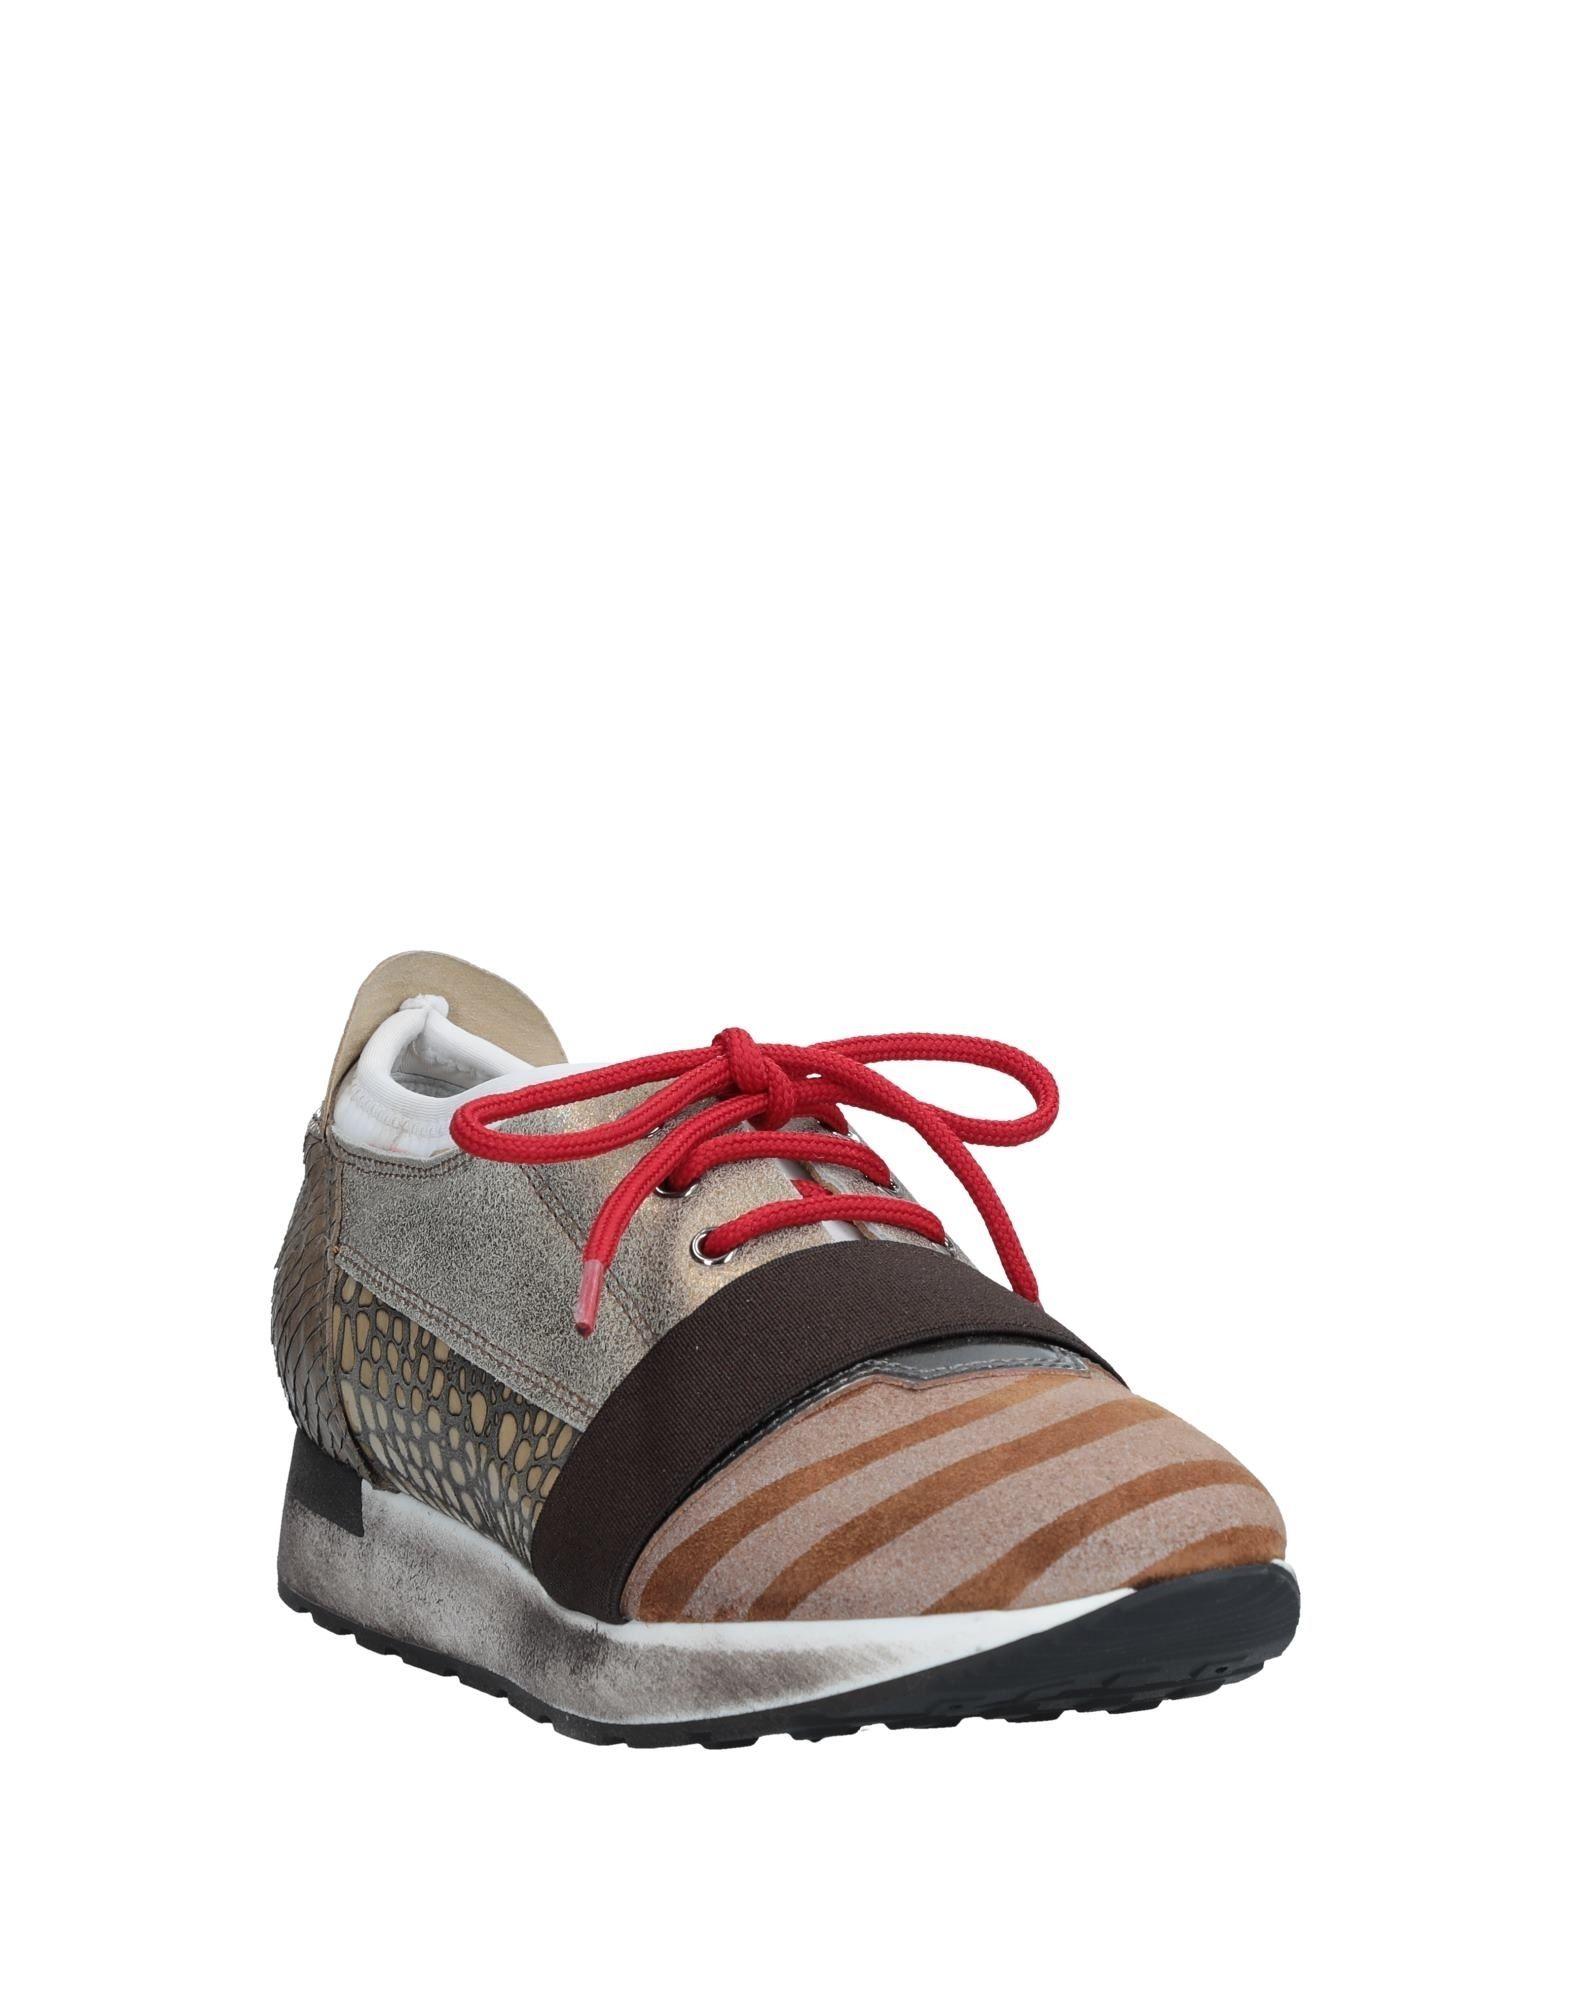 Ebarrito Gute Sneakers Damen  11537665HG Gute Ebarrito Qualität beliebte Schuhe fc7710